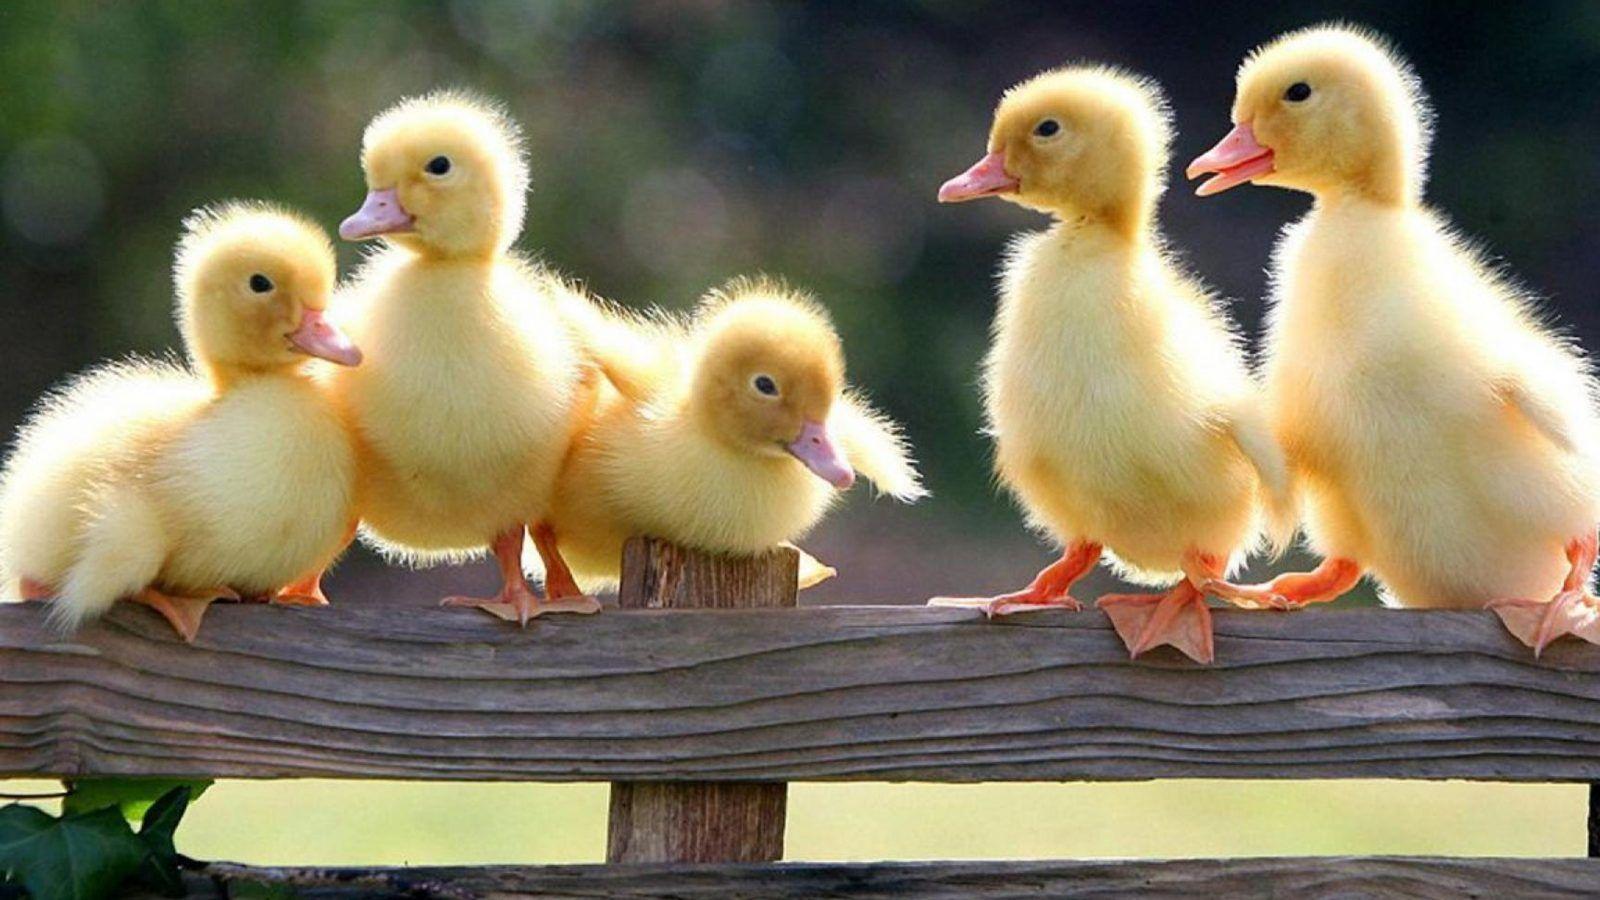 Baby Ducklings Wallpapers - Wallpaper Cave